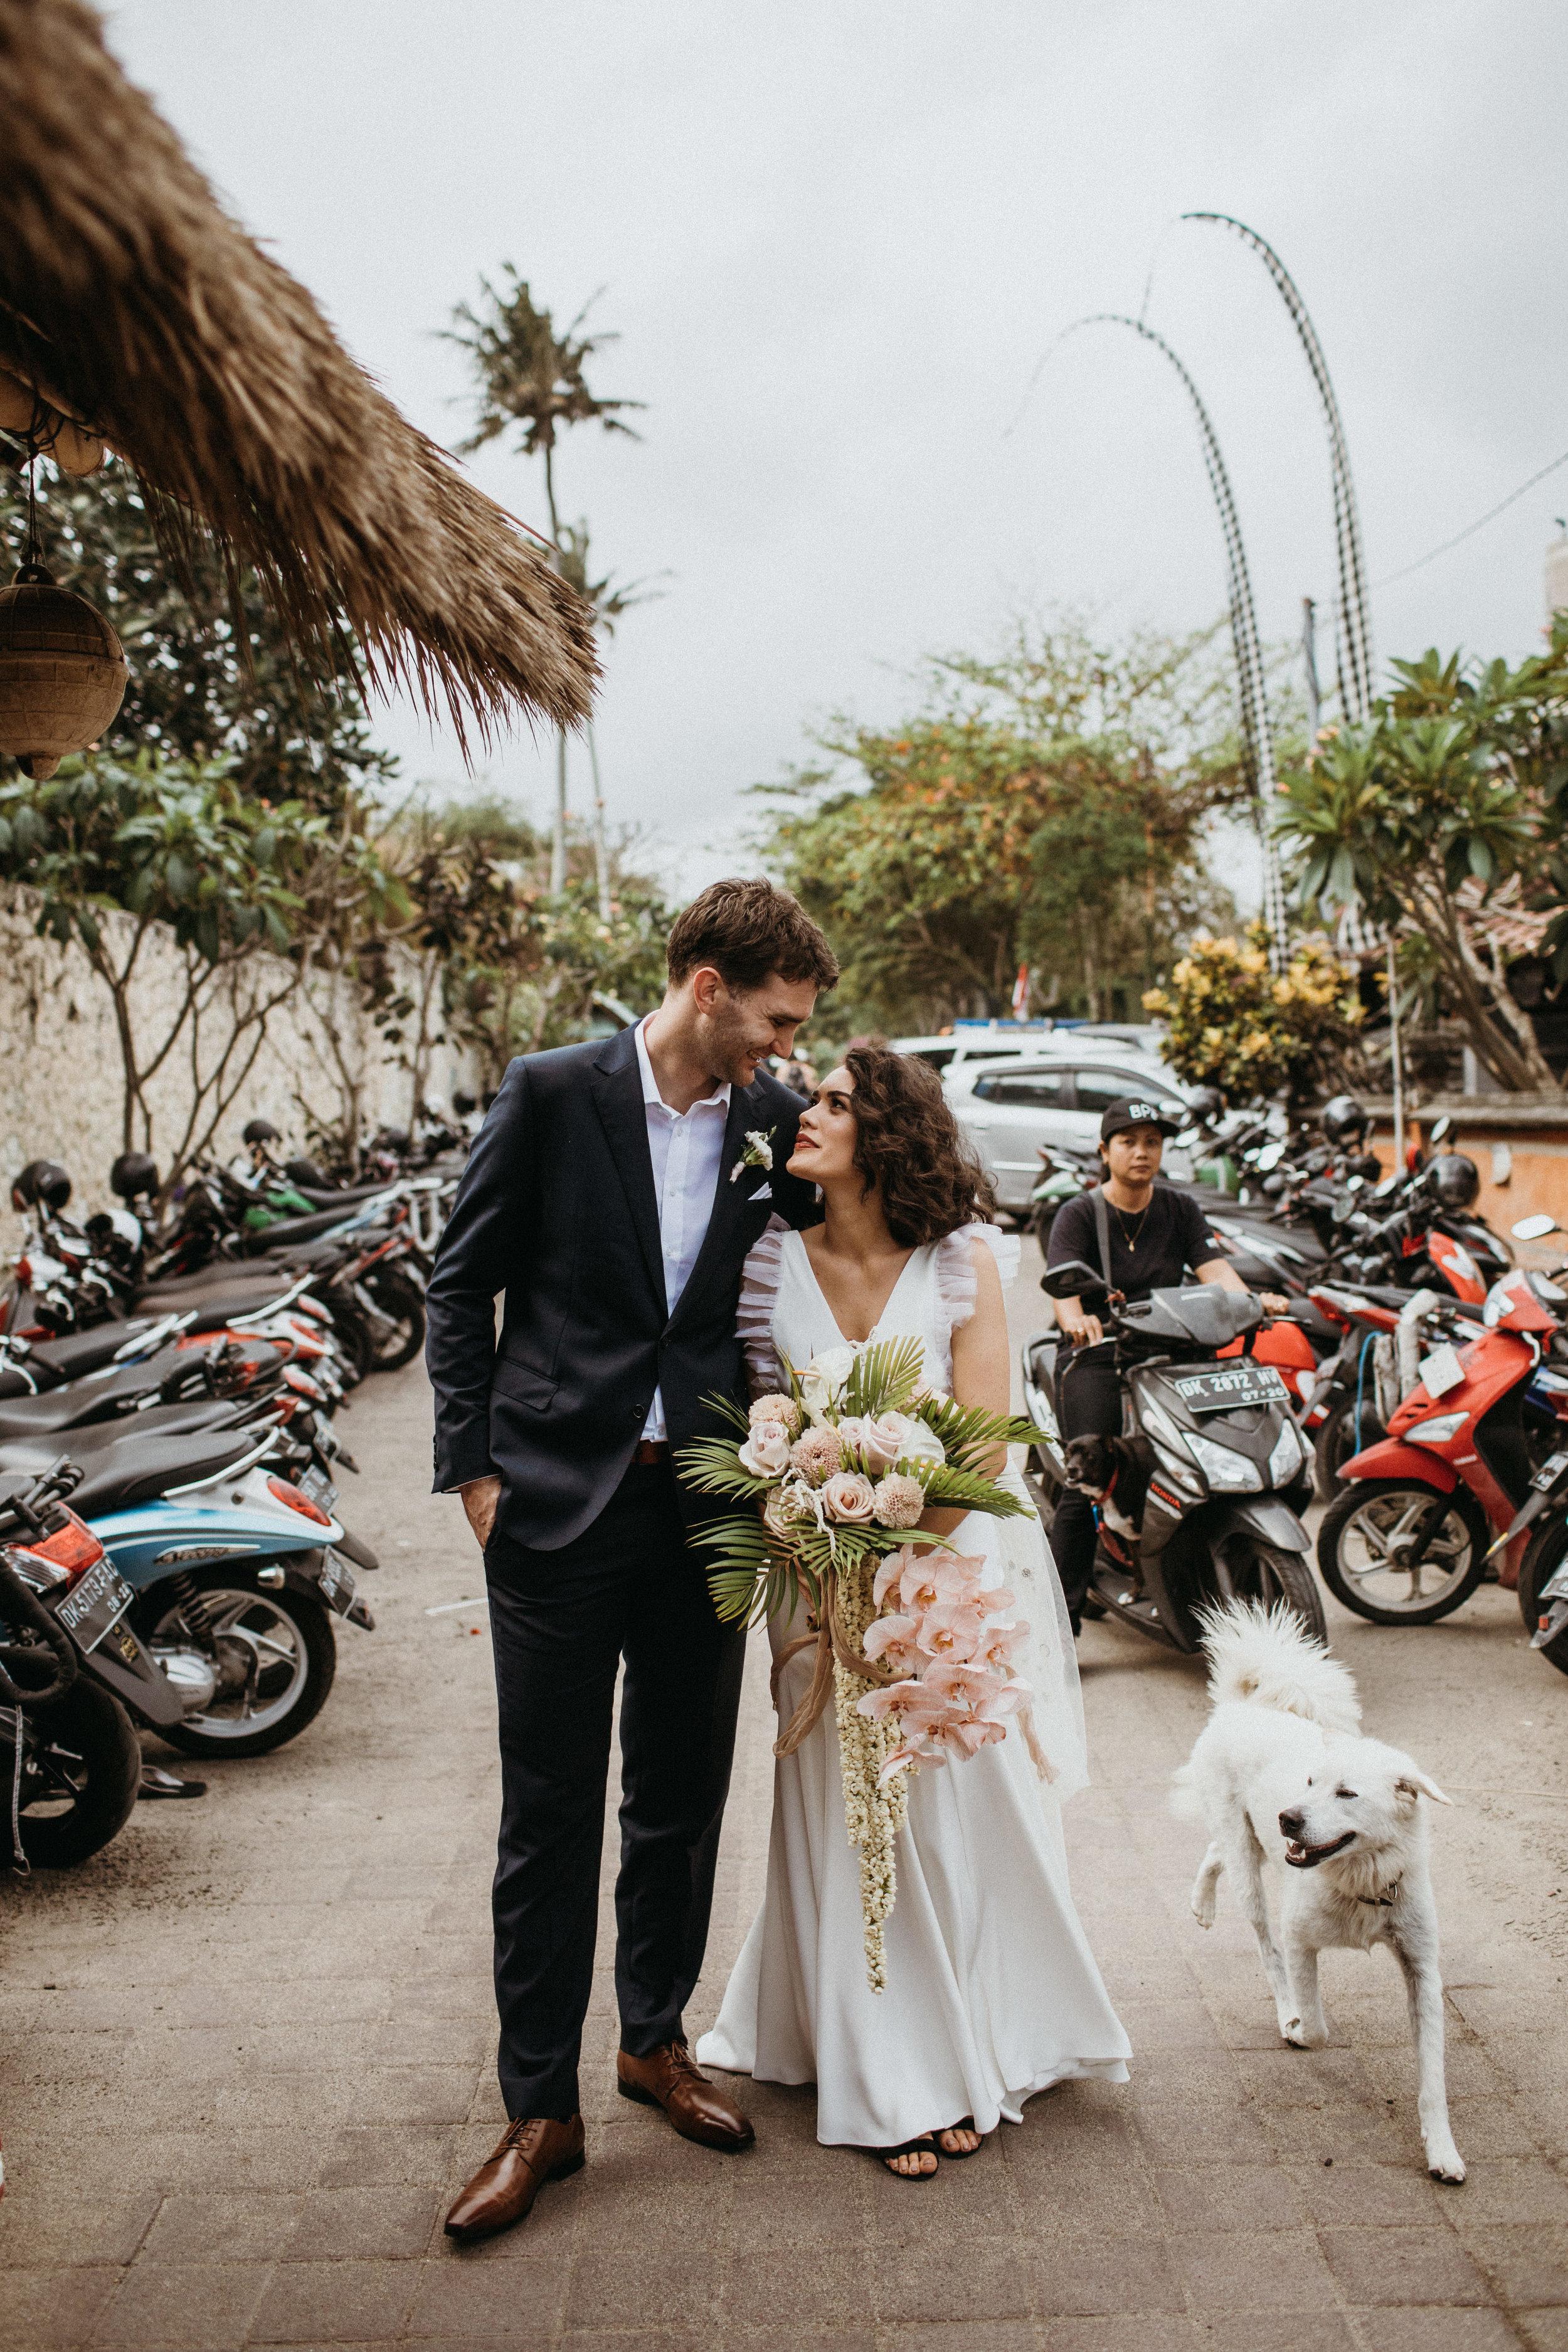 Cain & Melissa // Photo: Natasja Kremers